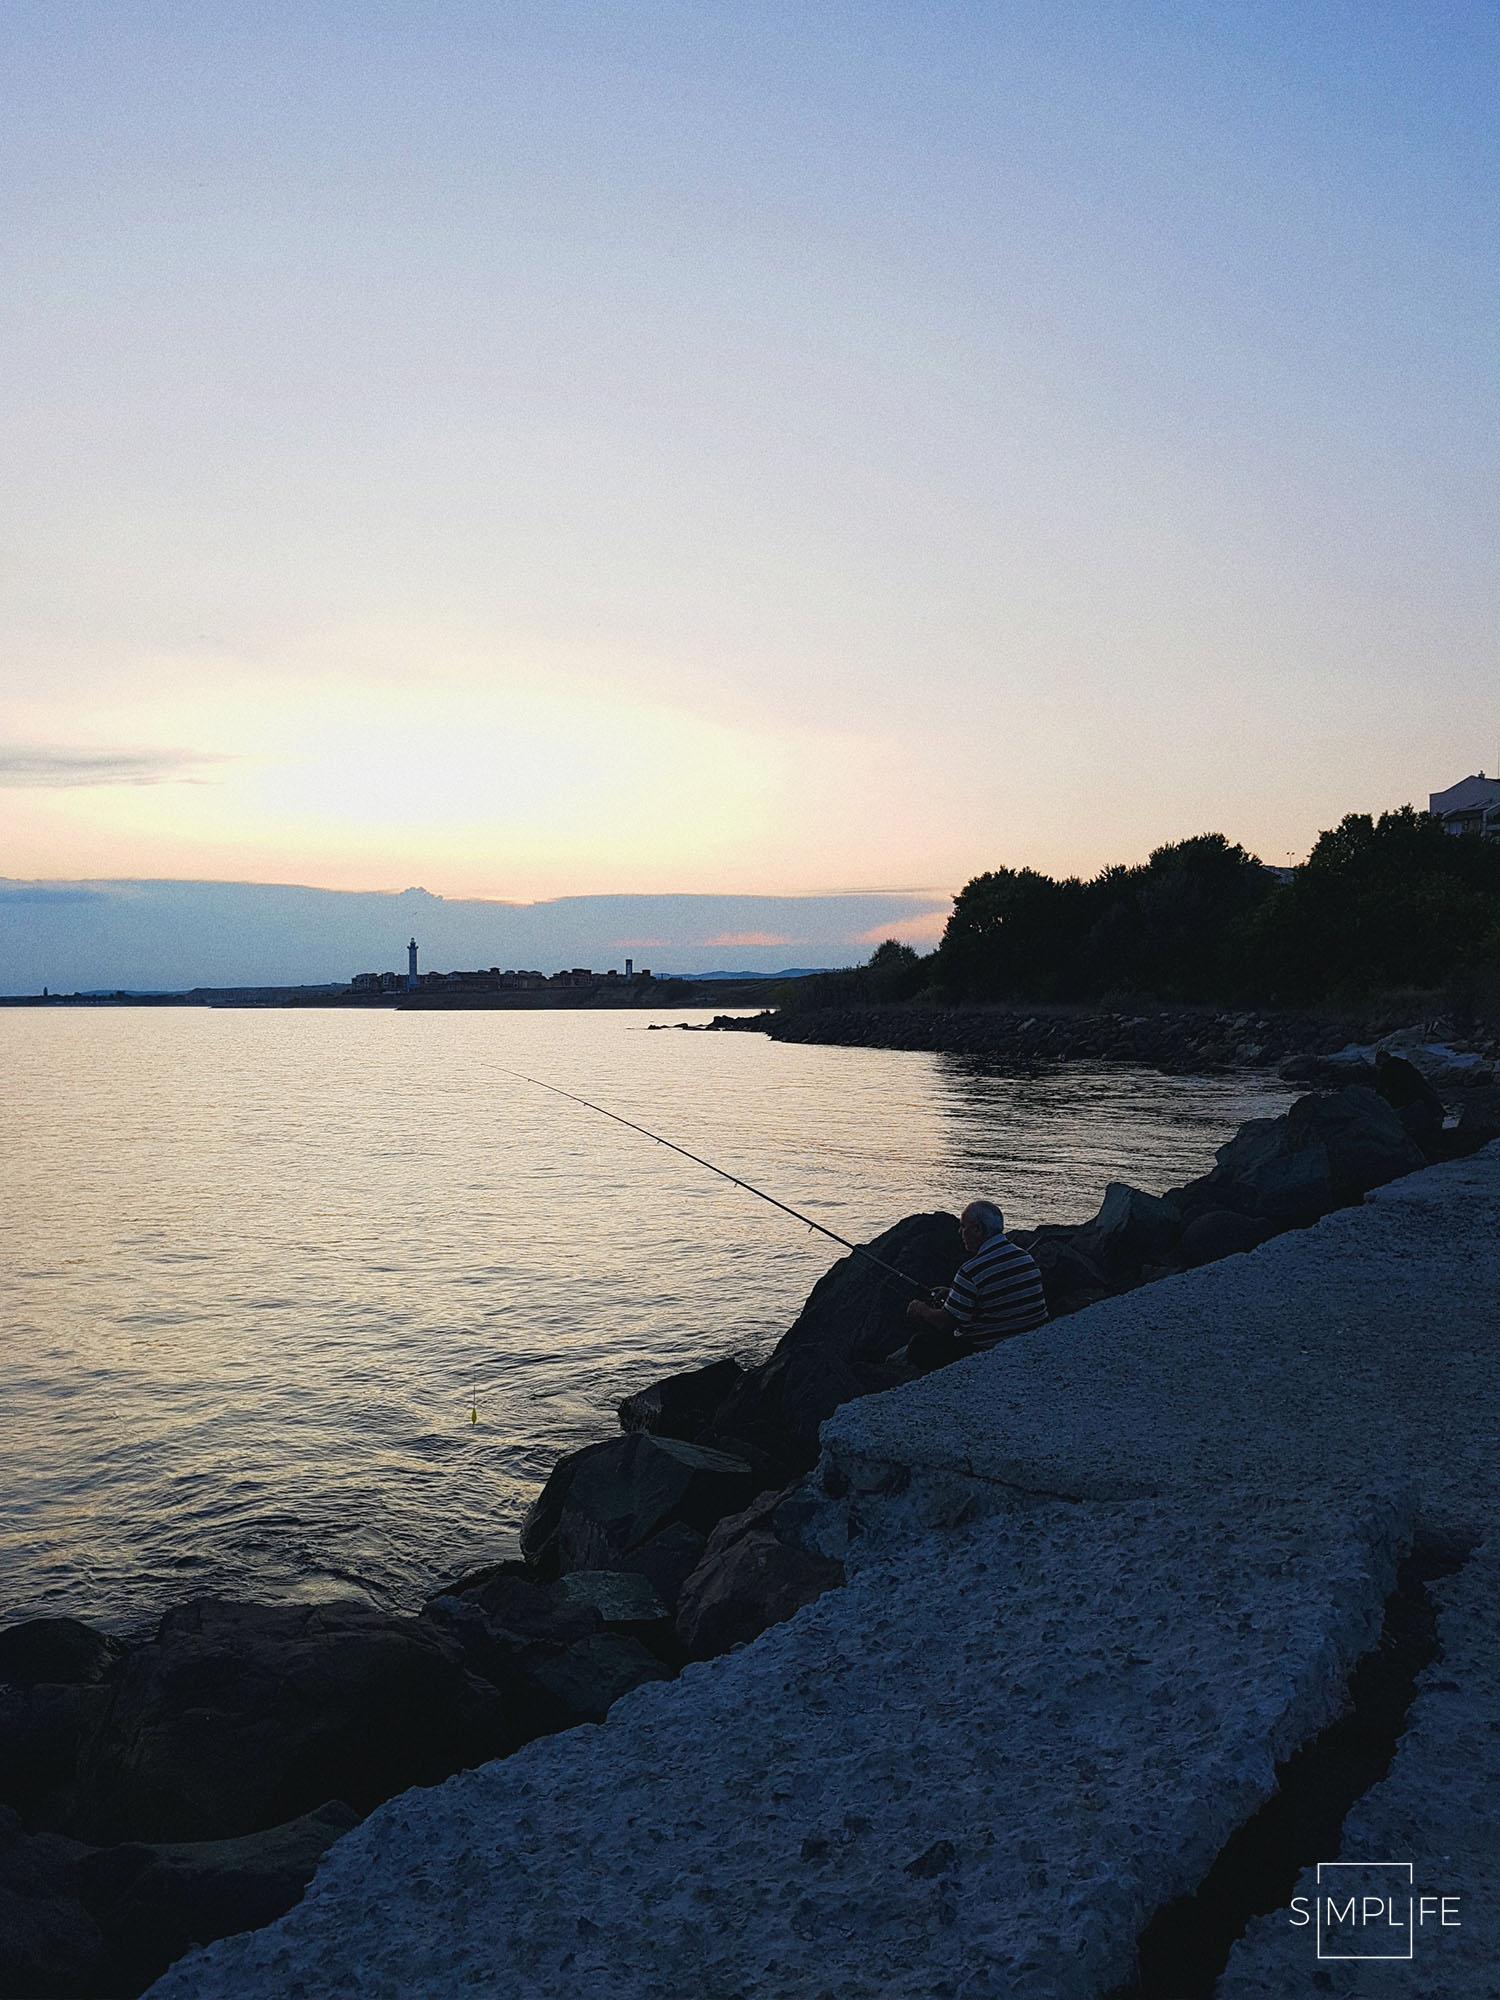 Bułgaria zachód słońca